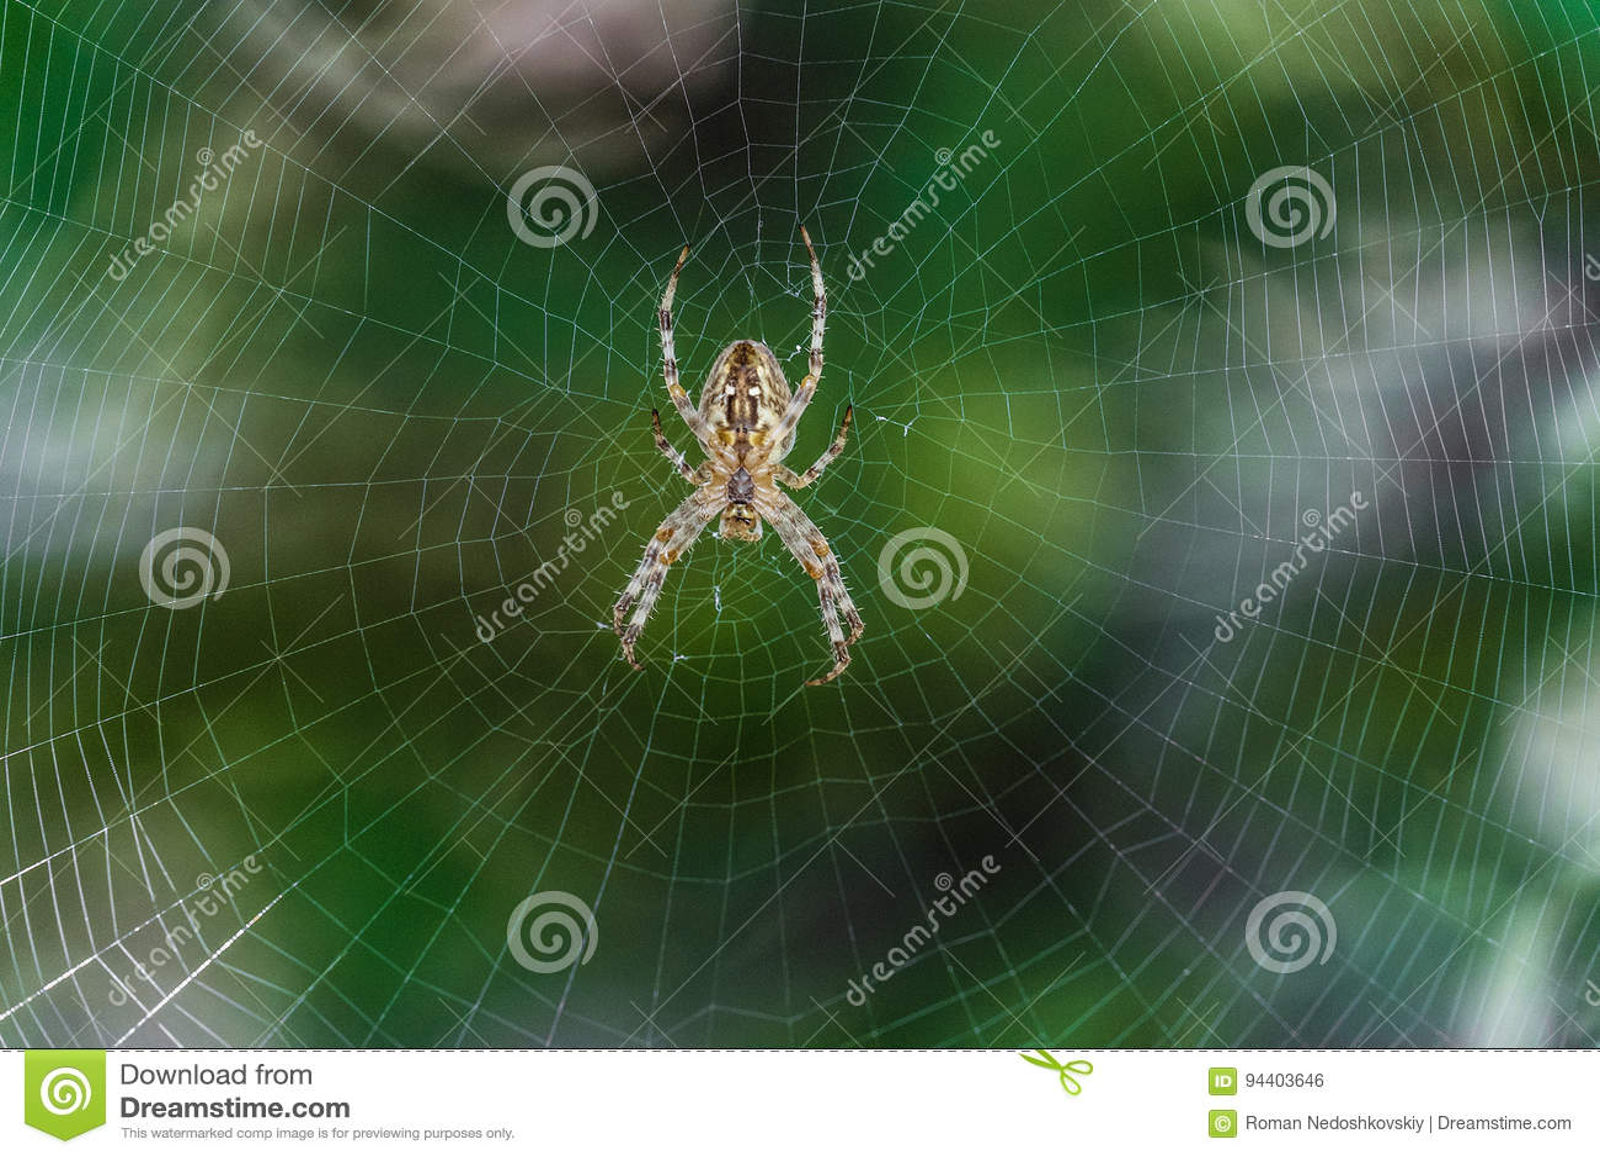 Big Garden,spider Araneus In The Center Of Web. Cobweb With